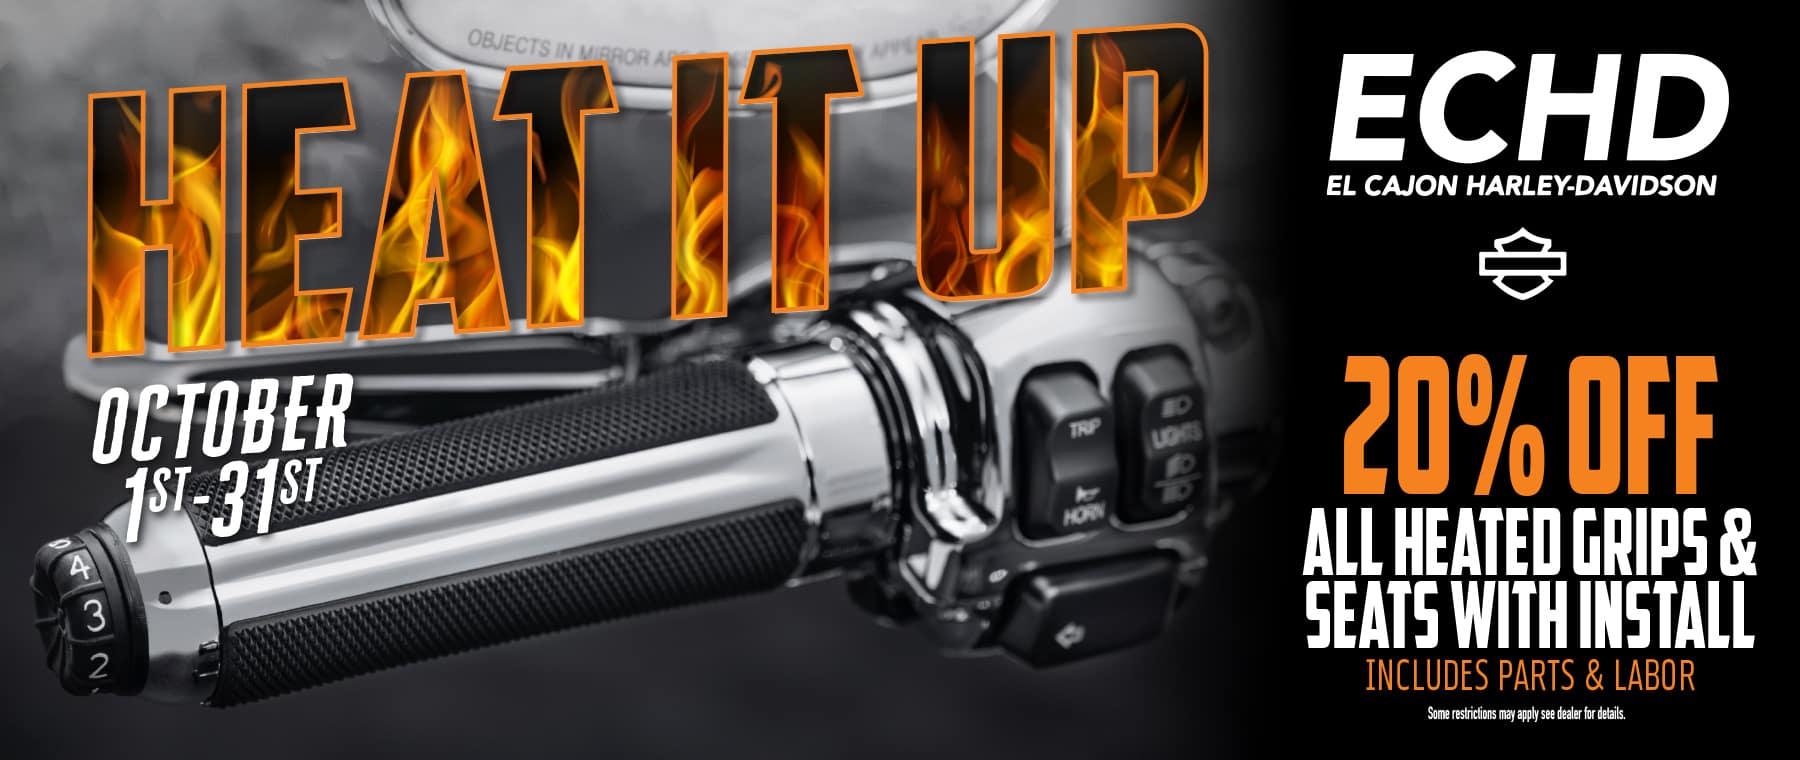 1800x760_CA01_Heated_Grips_Promo